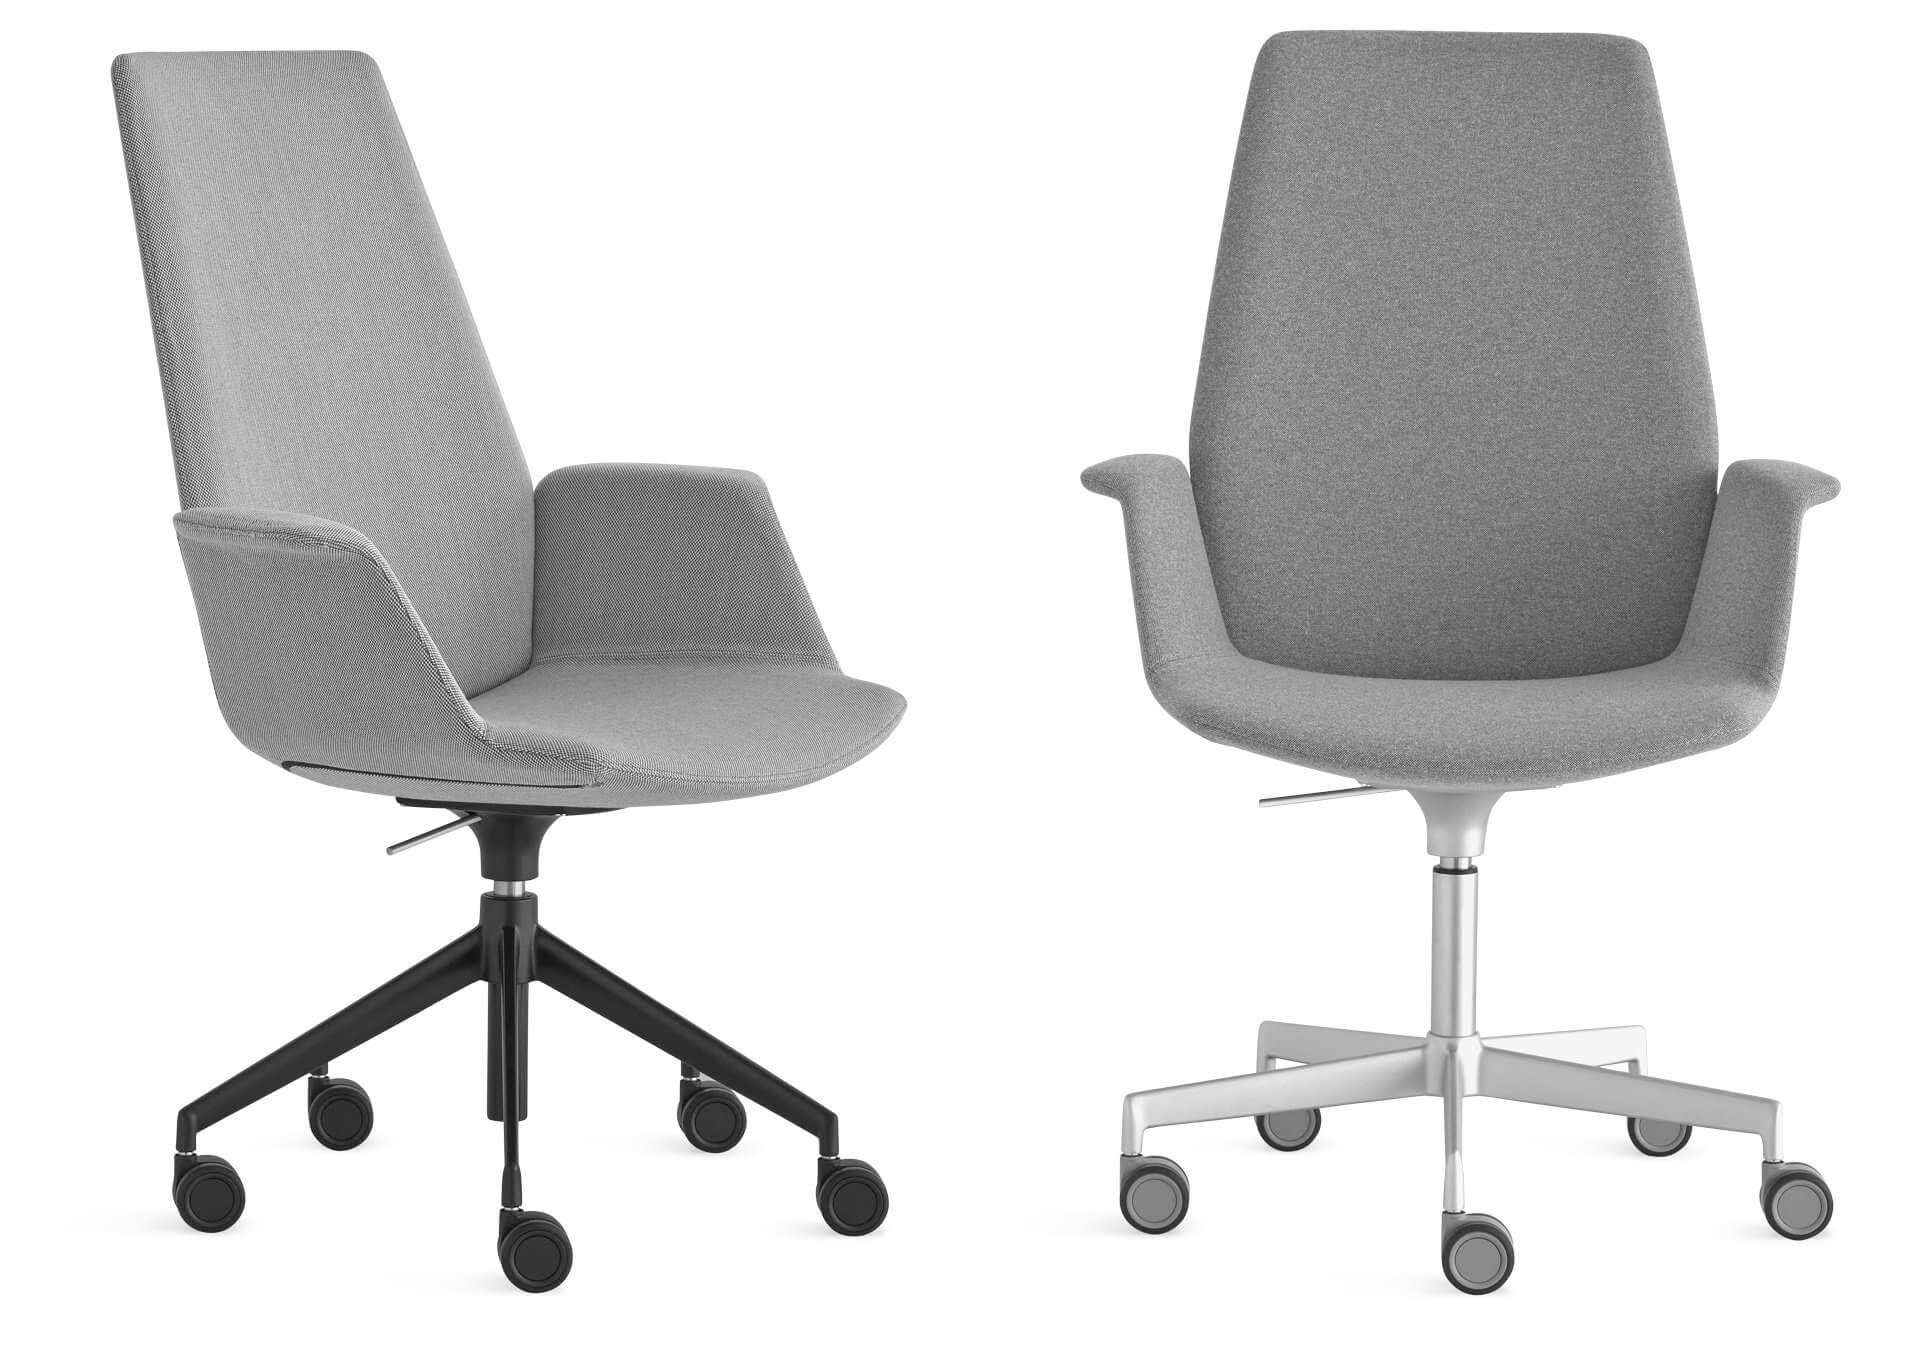 Chaise de bureau design et ergonomique UNO.